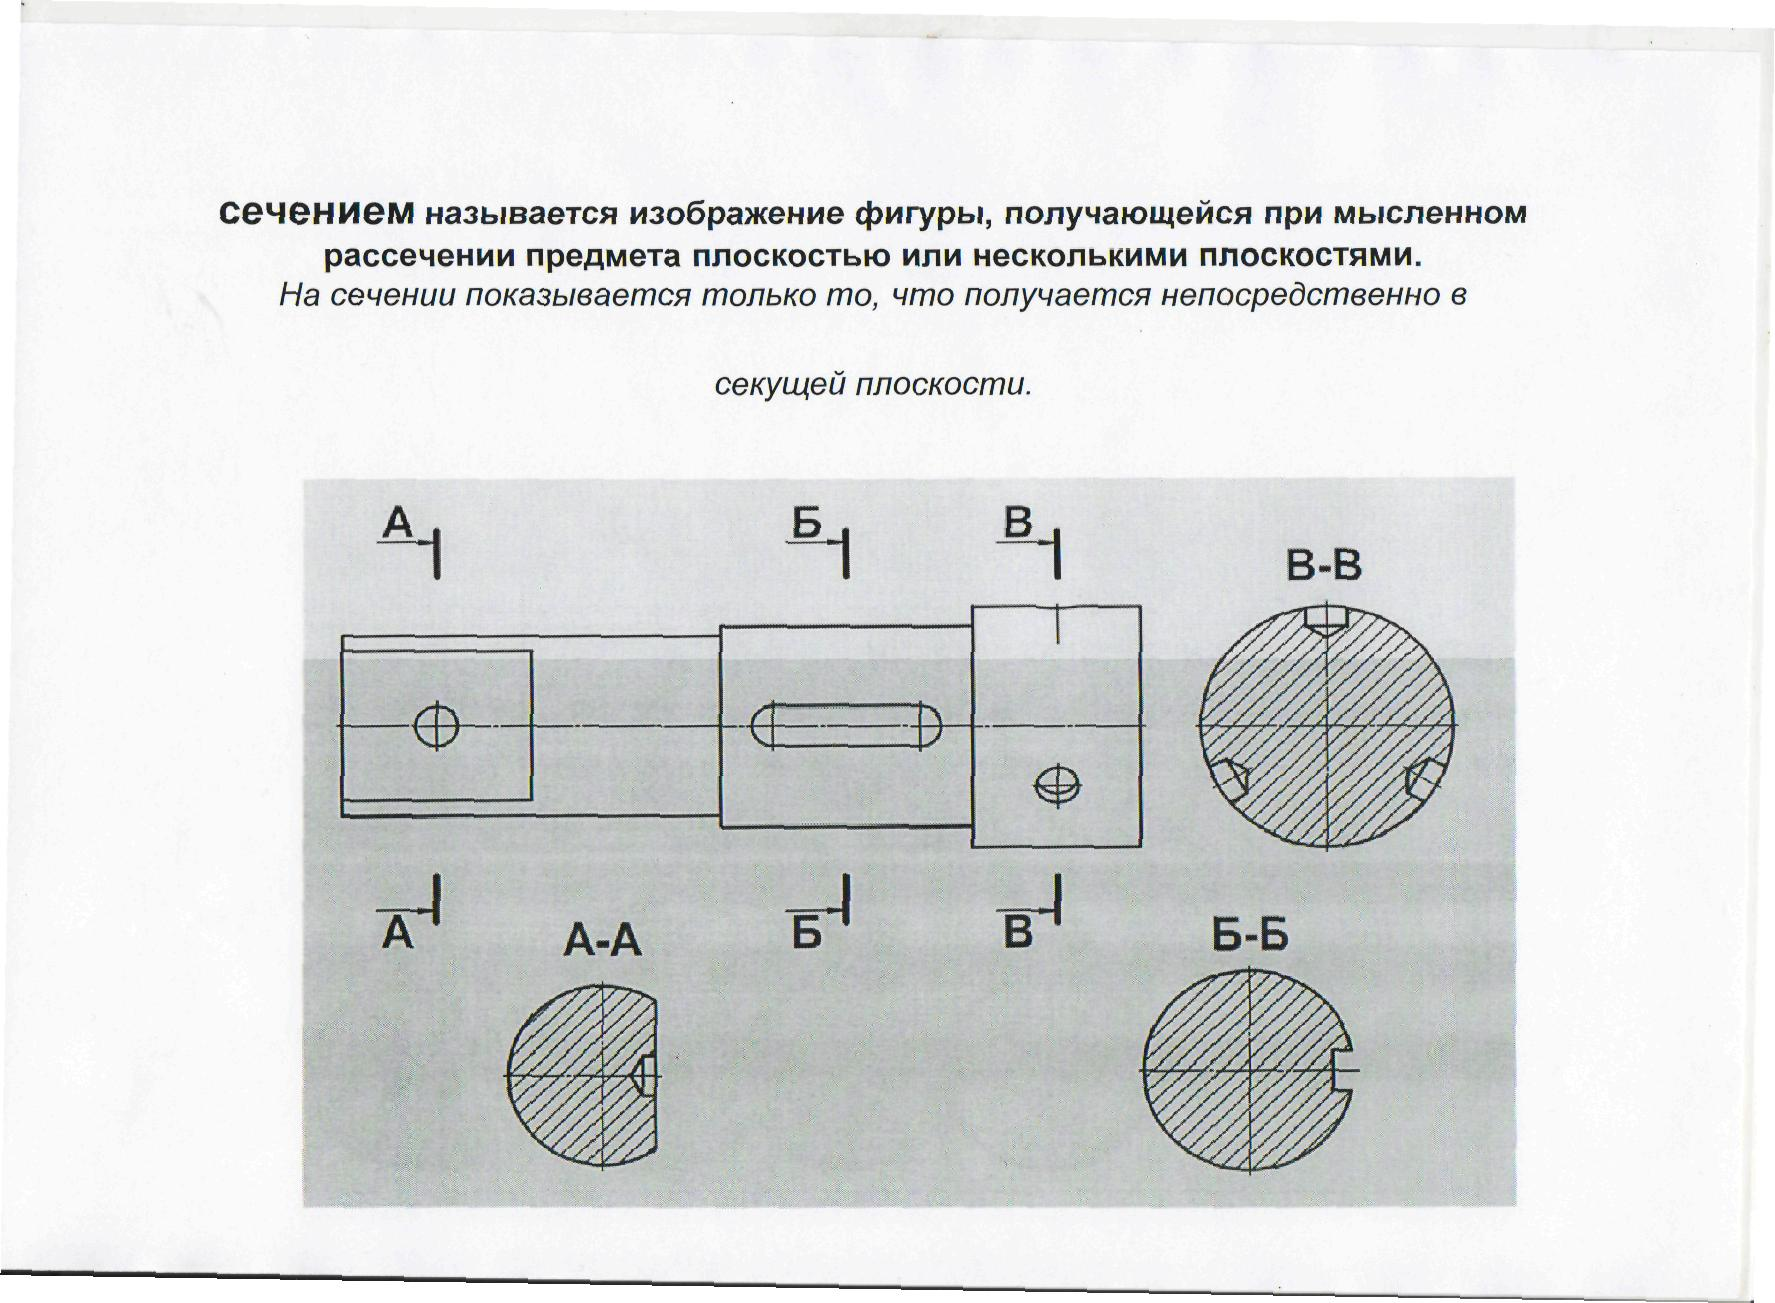 C:\Documents and Settings\1\Мои документы\урок на конкурс 31 октября 2013\8.jpg